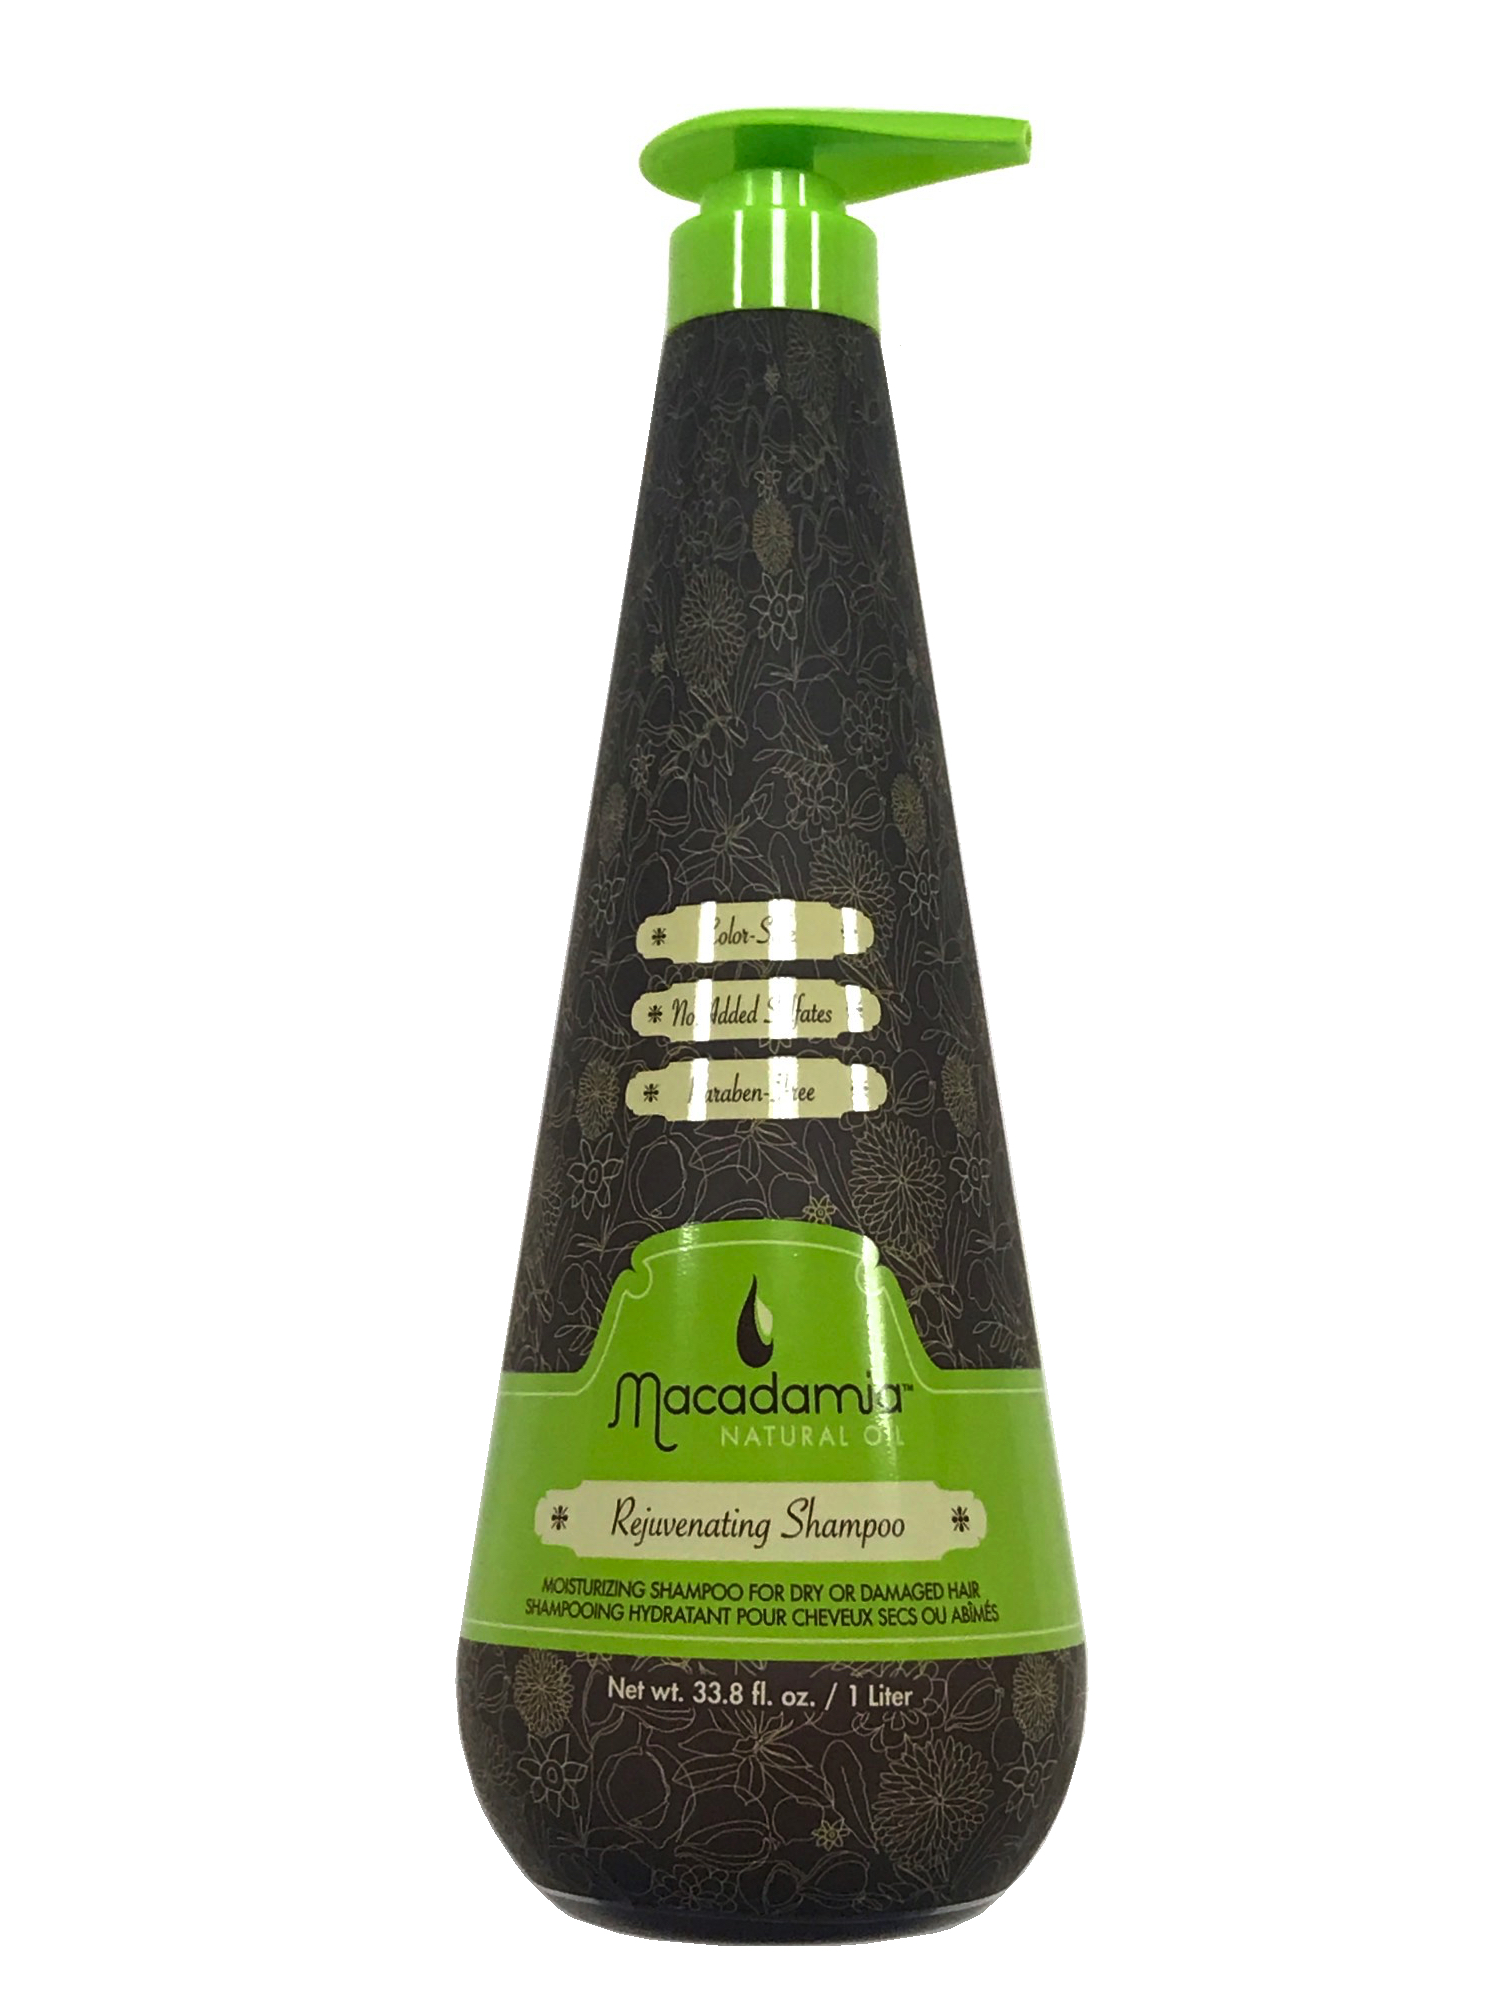 Macadamia Hair Care Rejuvenating Shampoo 33.8 oz